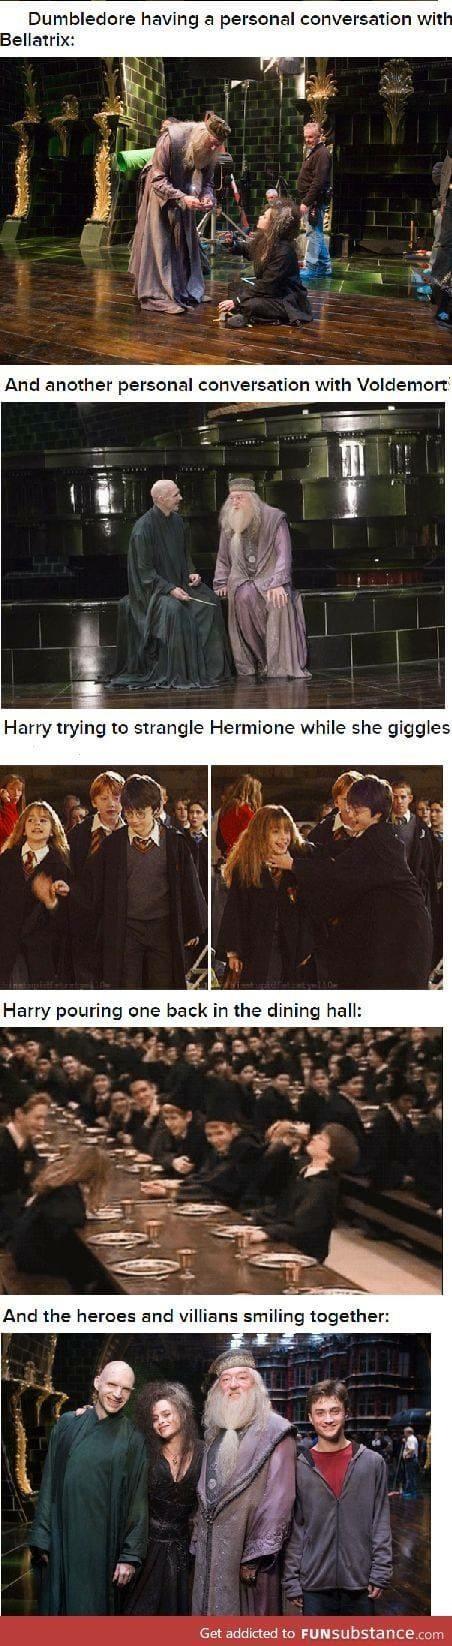 Pin By Rachele Cereti On Harry Potter Harry Potter Parts Harry Potter Jokes Harry Potter Funny